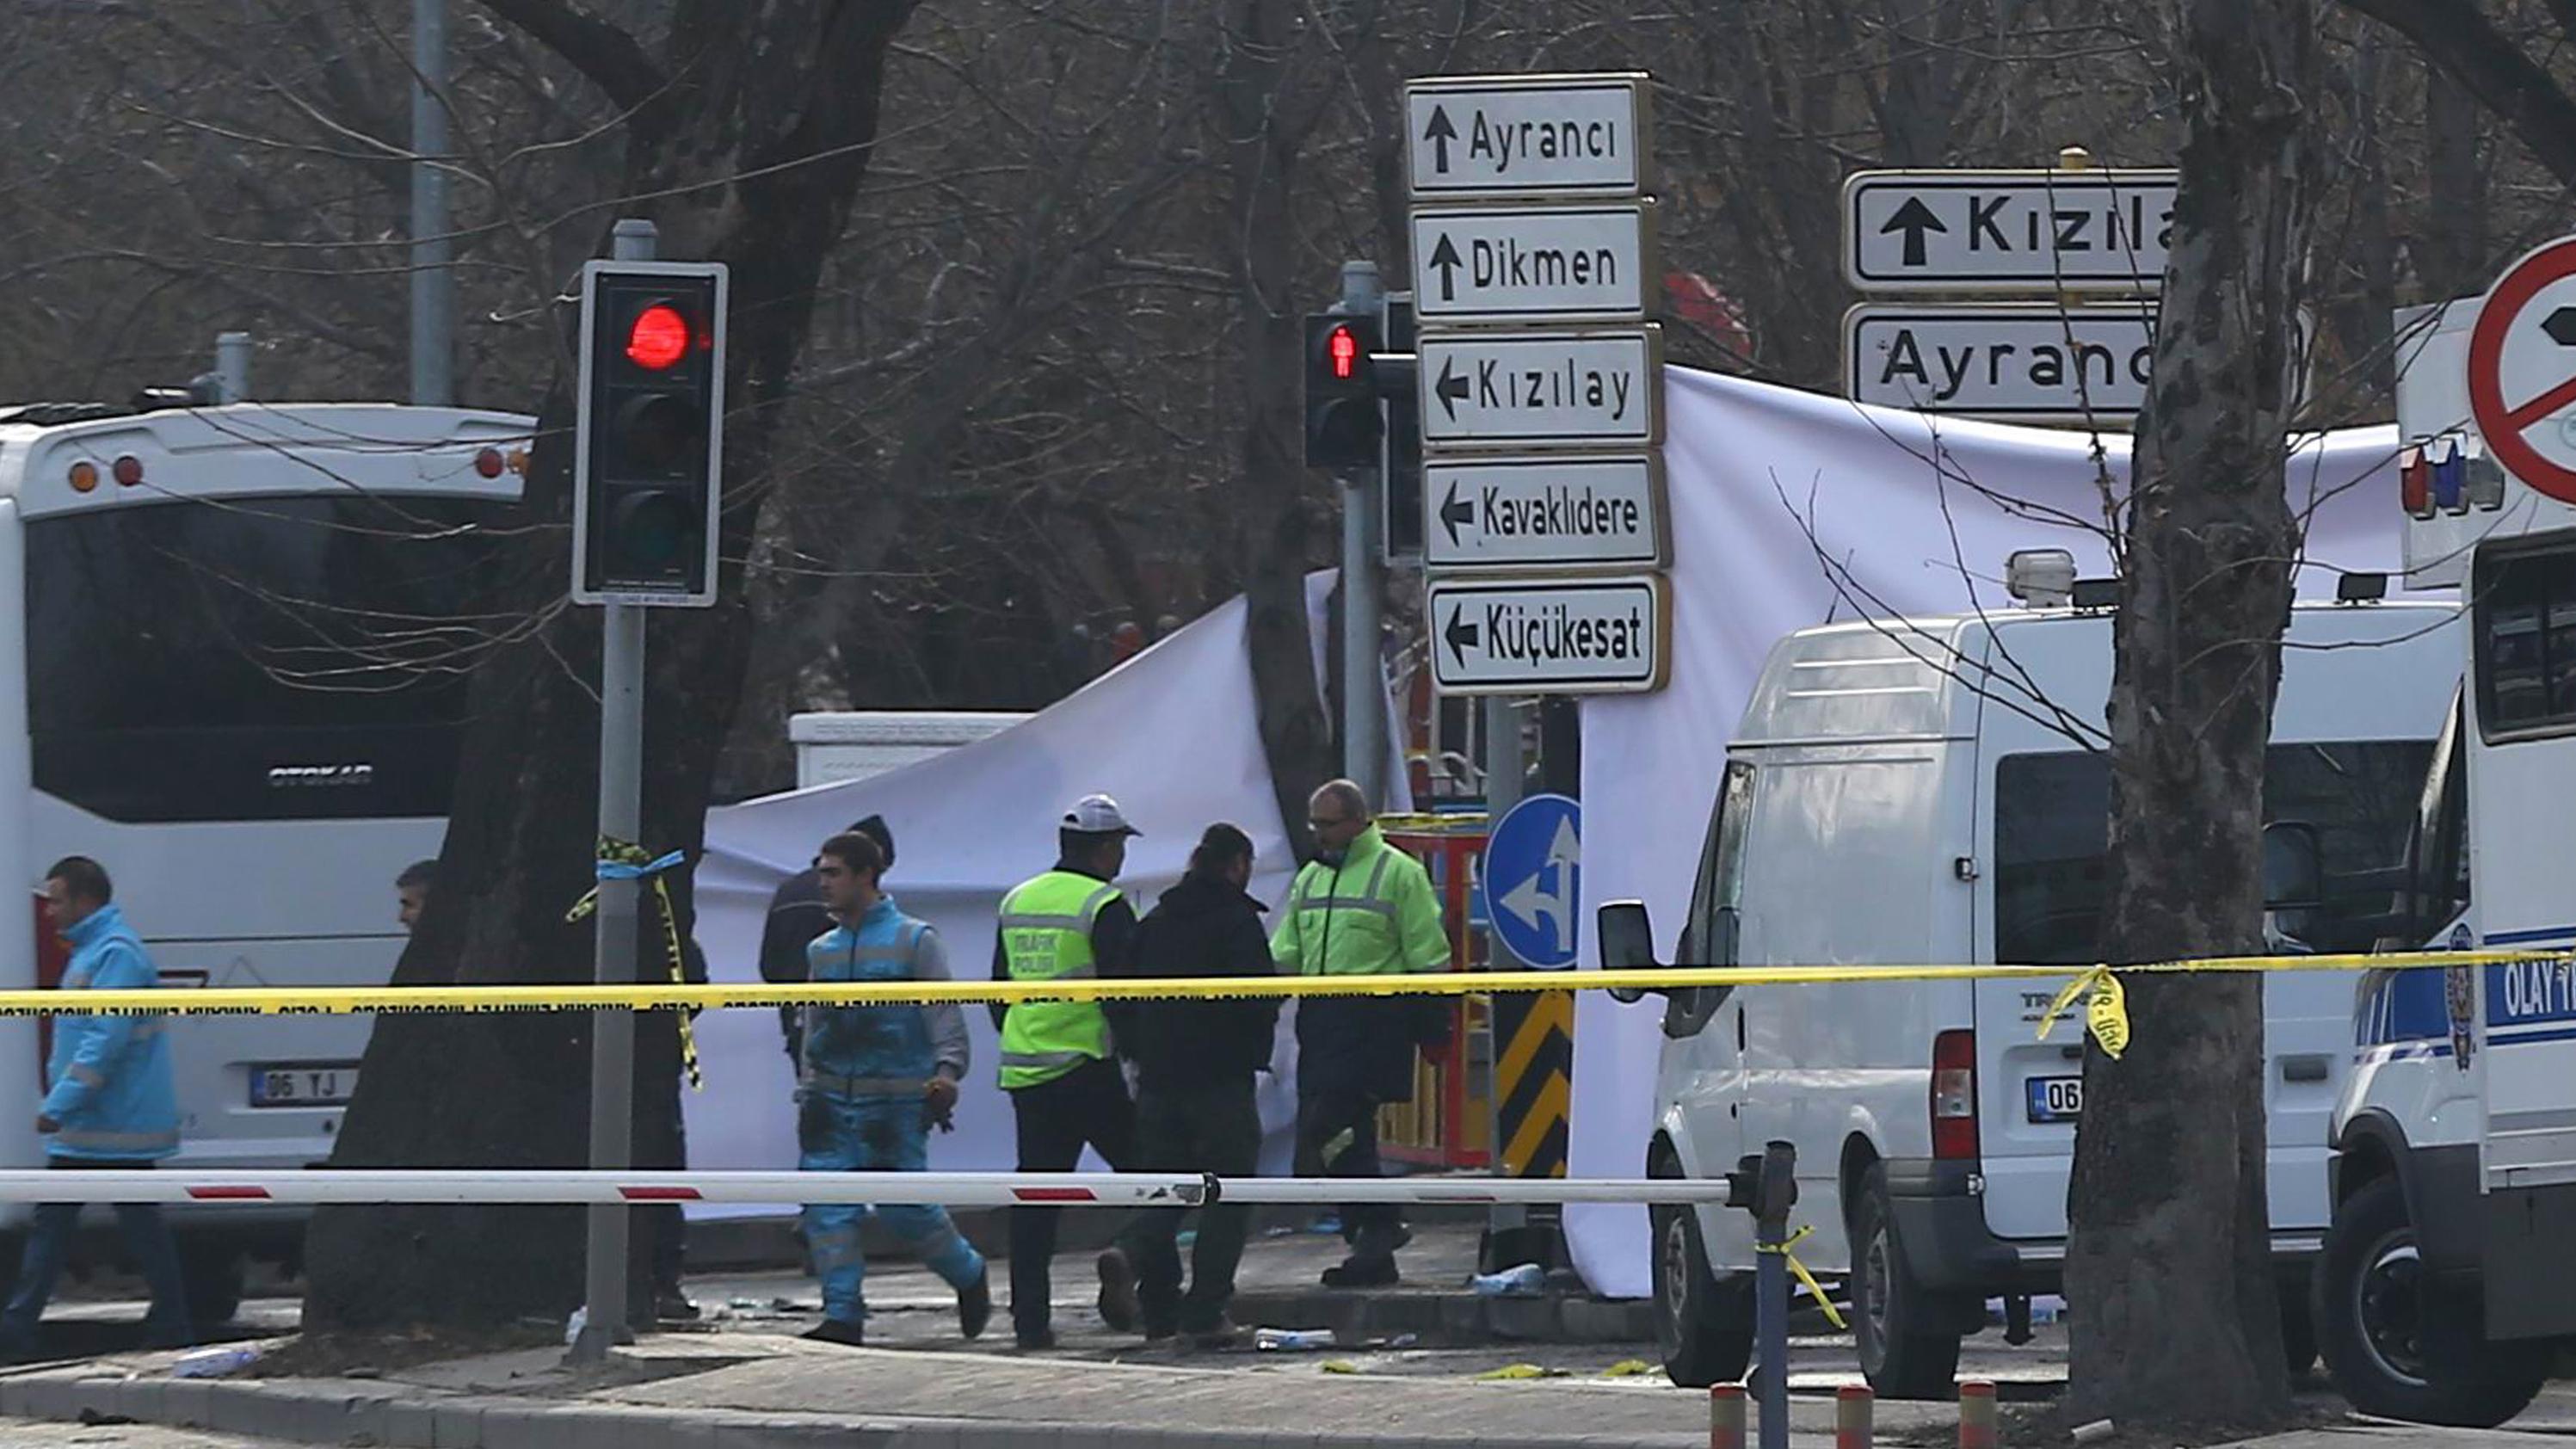 Turkey Arrests 14 Over Ankara Bombing; Leaders Blame Kurdish Groups